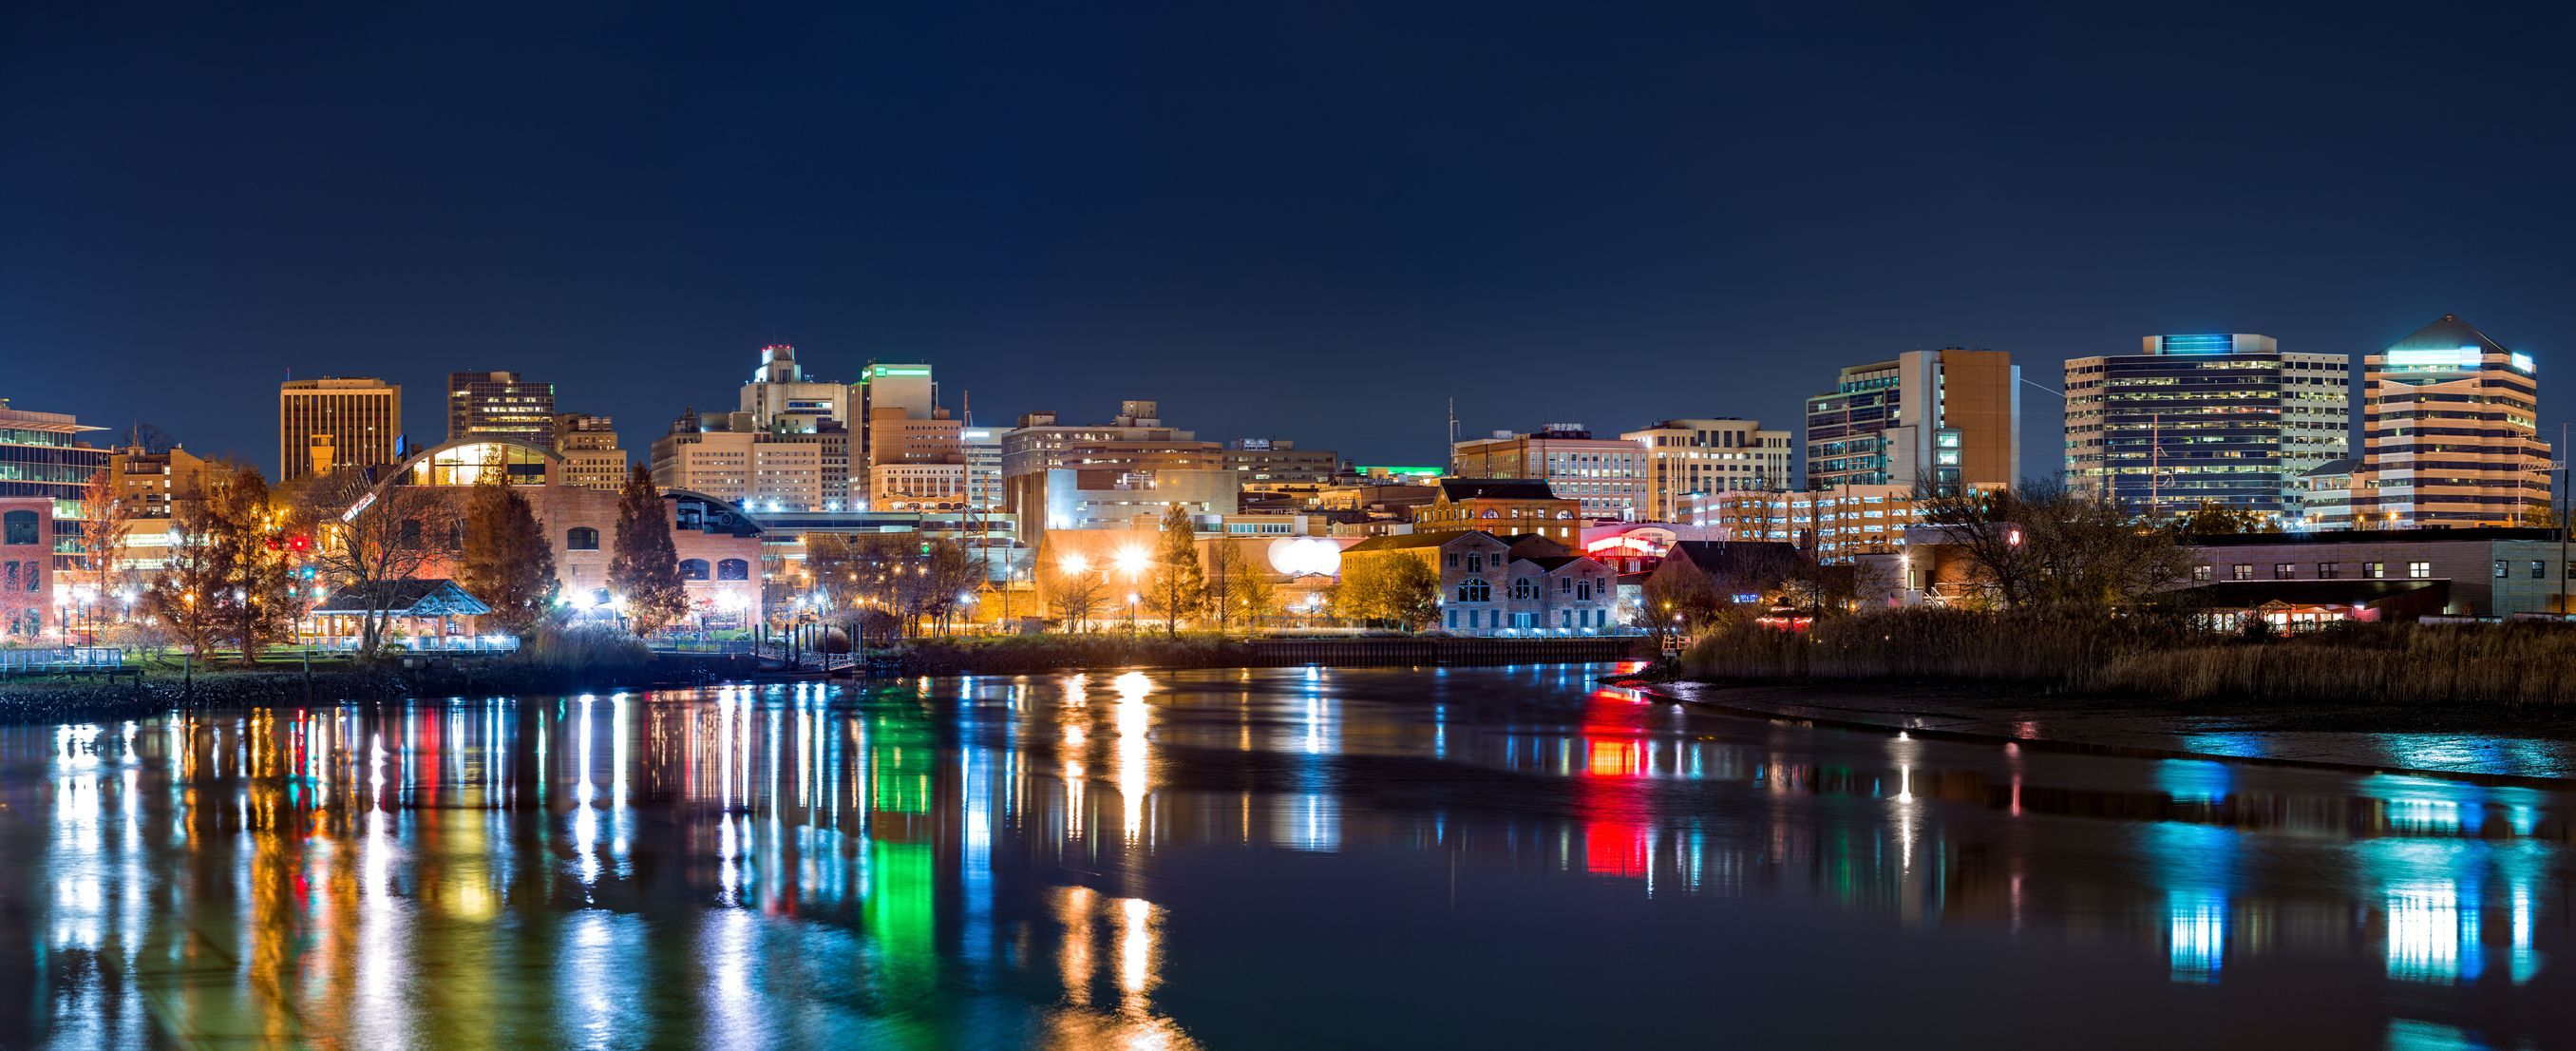 Wilmington, DE #4715